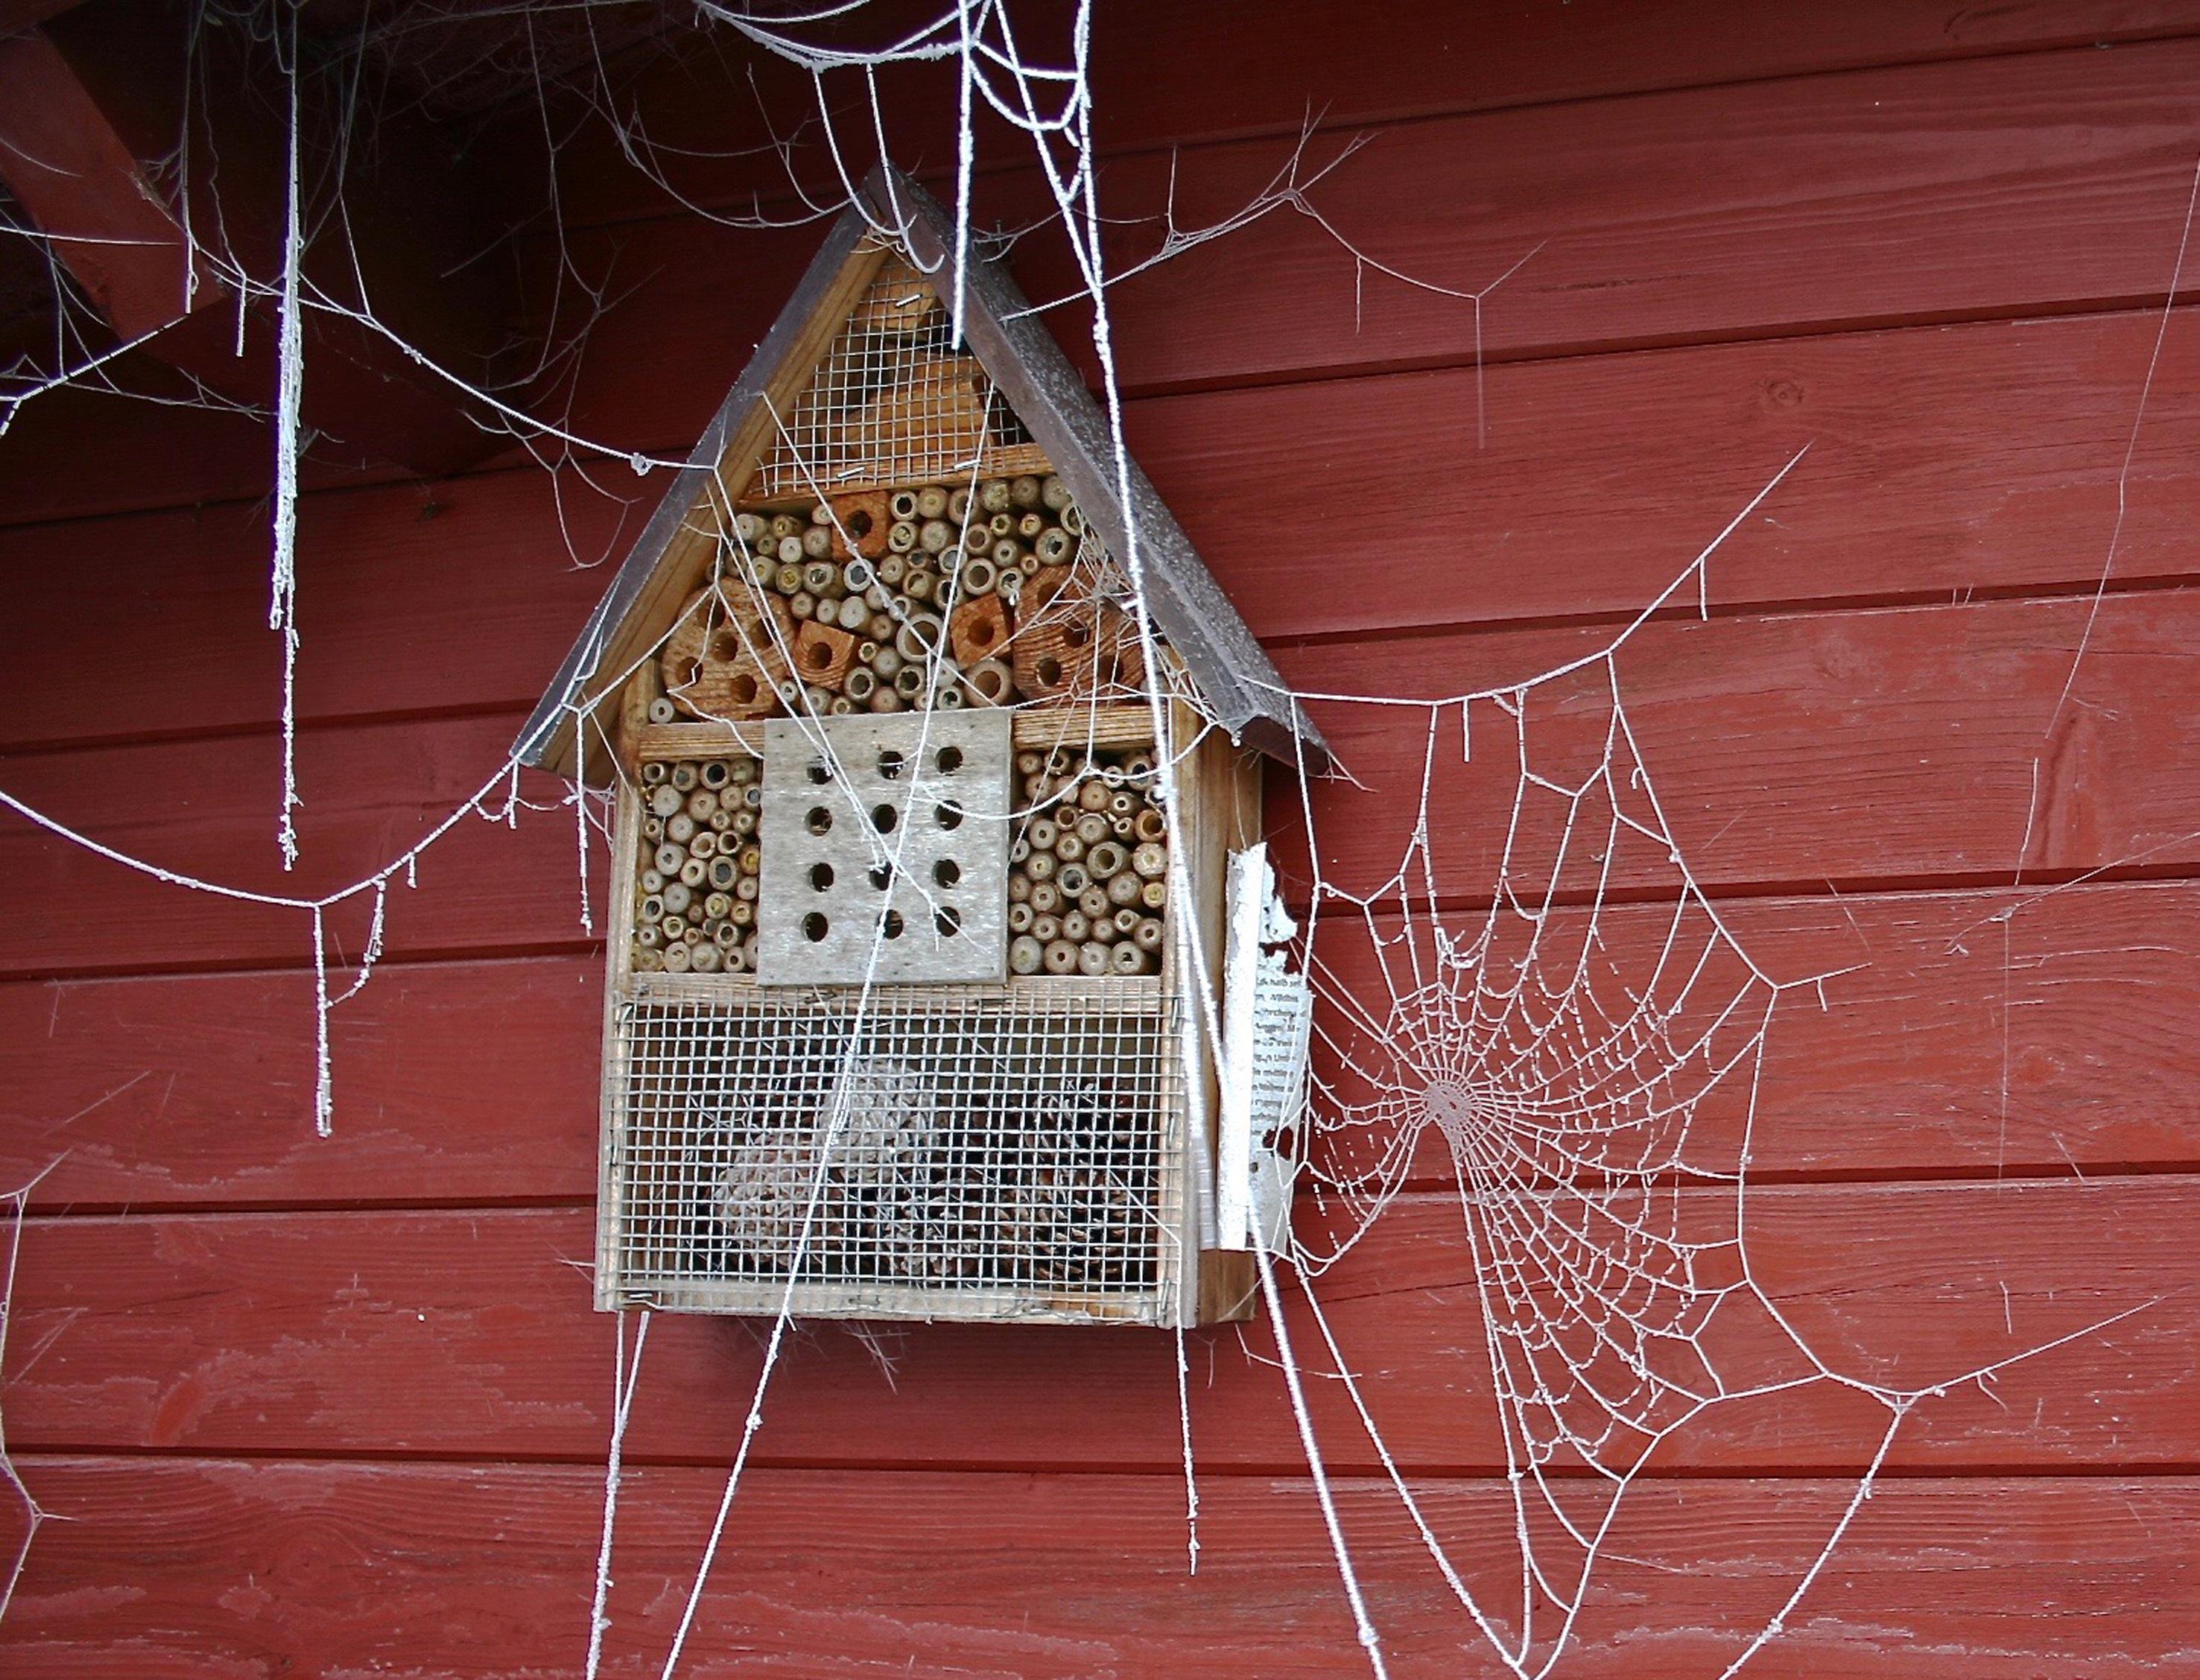 Fotos Gratis Fr O Invierno Roc O Casa Ventana Escarcha  ~ Webs De Decoraciã³n De Interiores